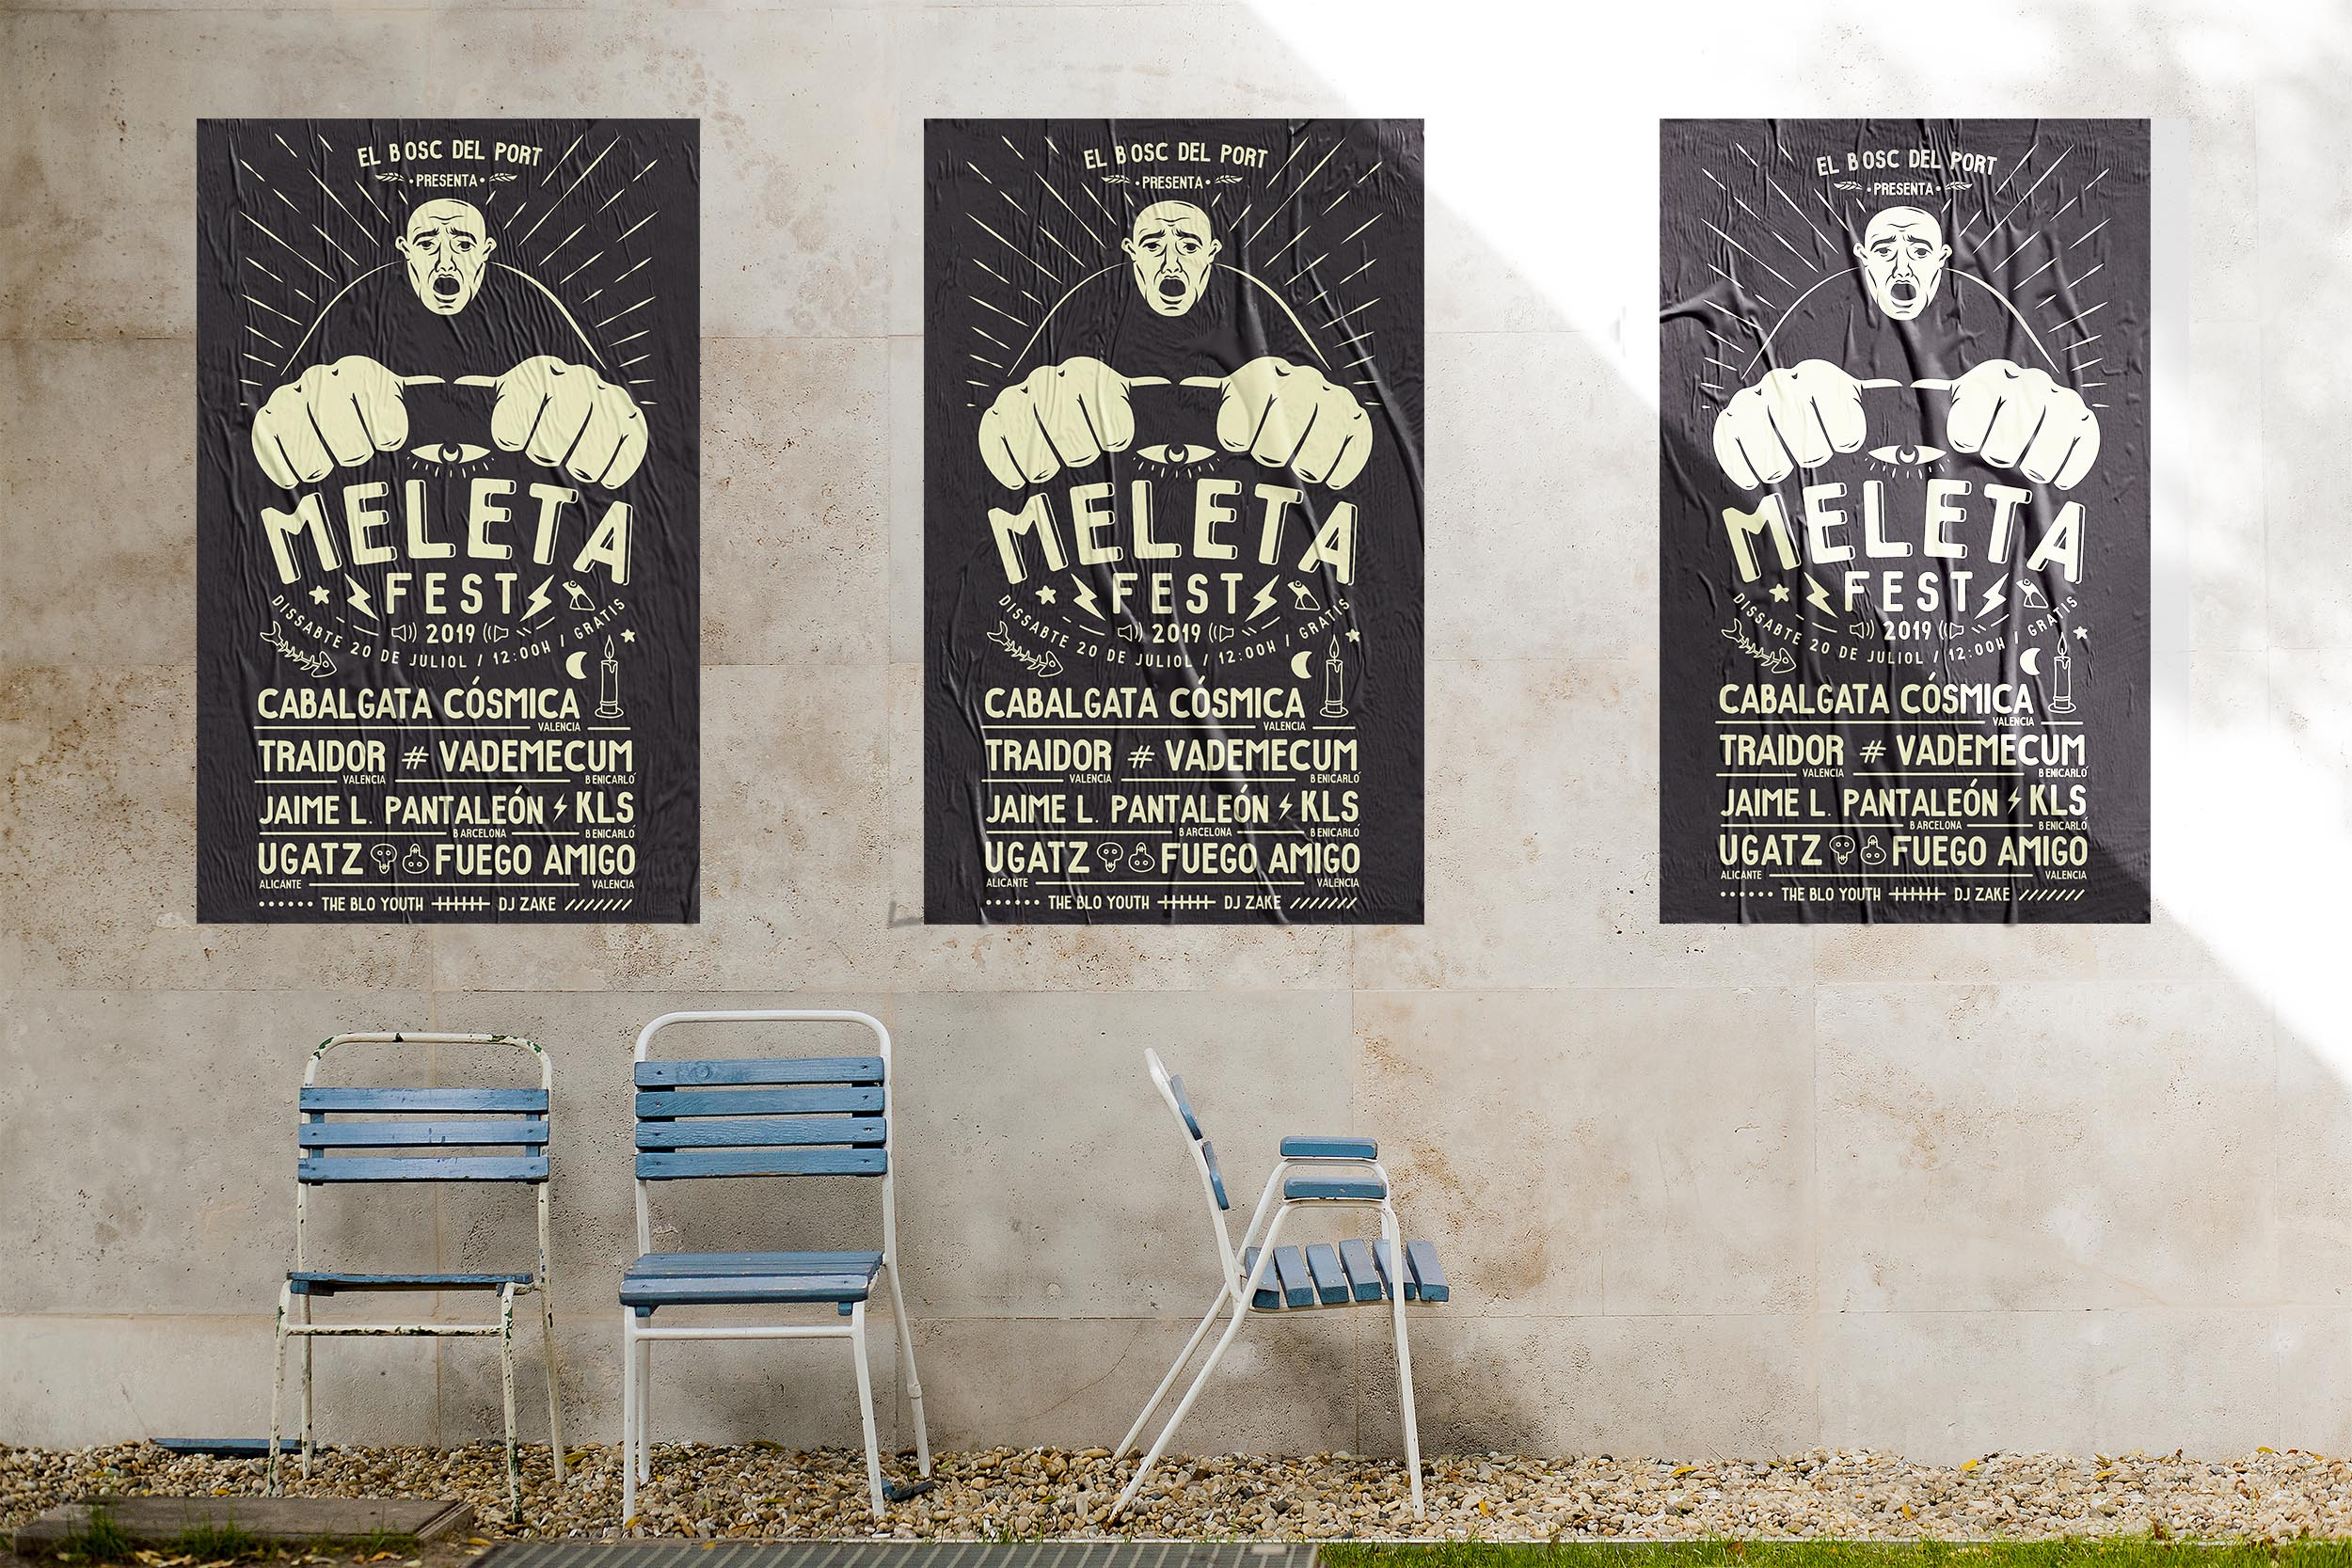 Meleta Fest 2019, cartel, poster, diseño gráfico, graphic design